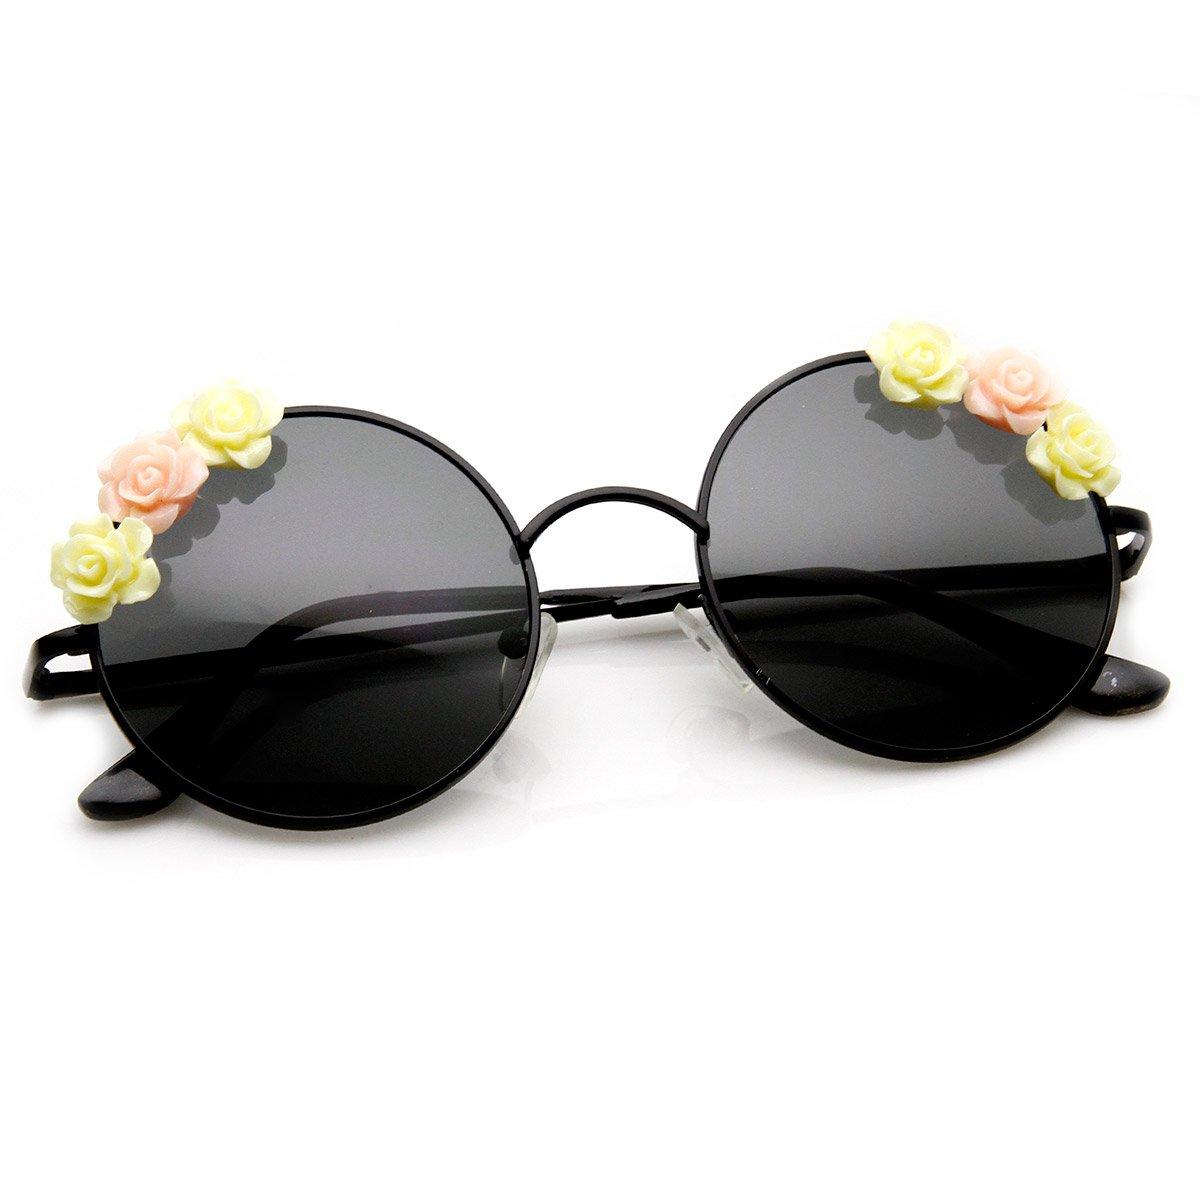 e03416e478 Amazon.com  Flower Adorned Hippie Floral Metal Circle Round Sunglasses  (Black)  Clothing